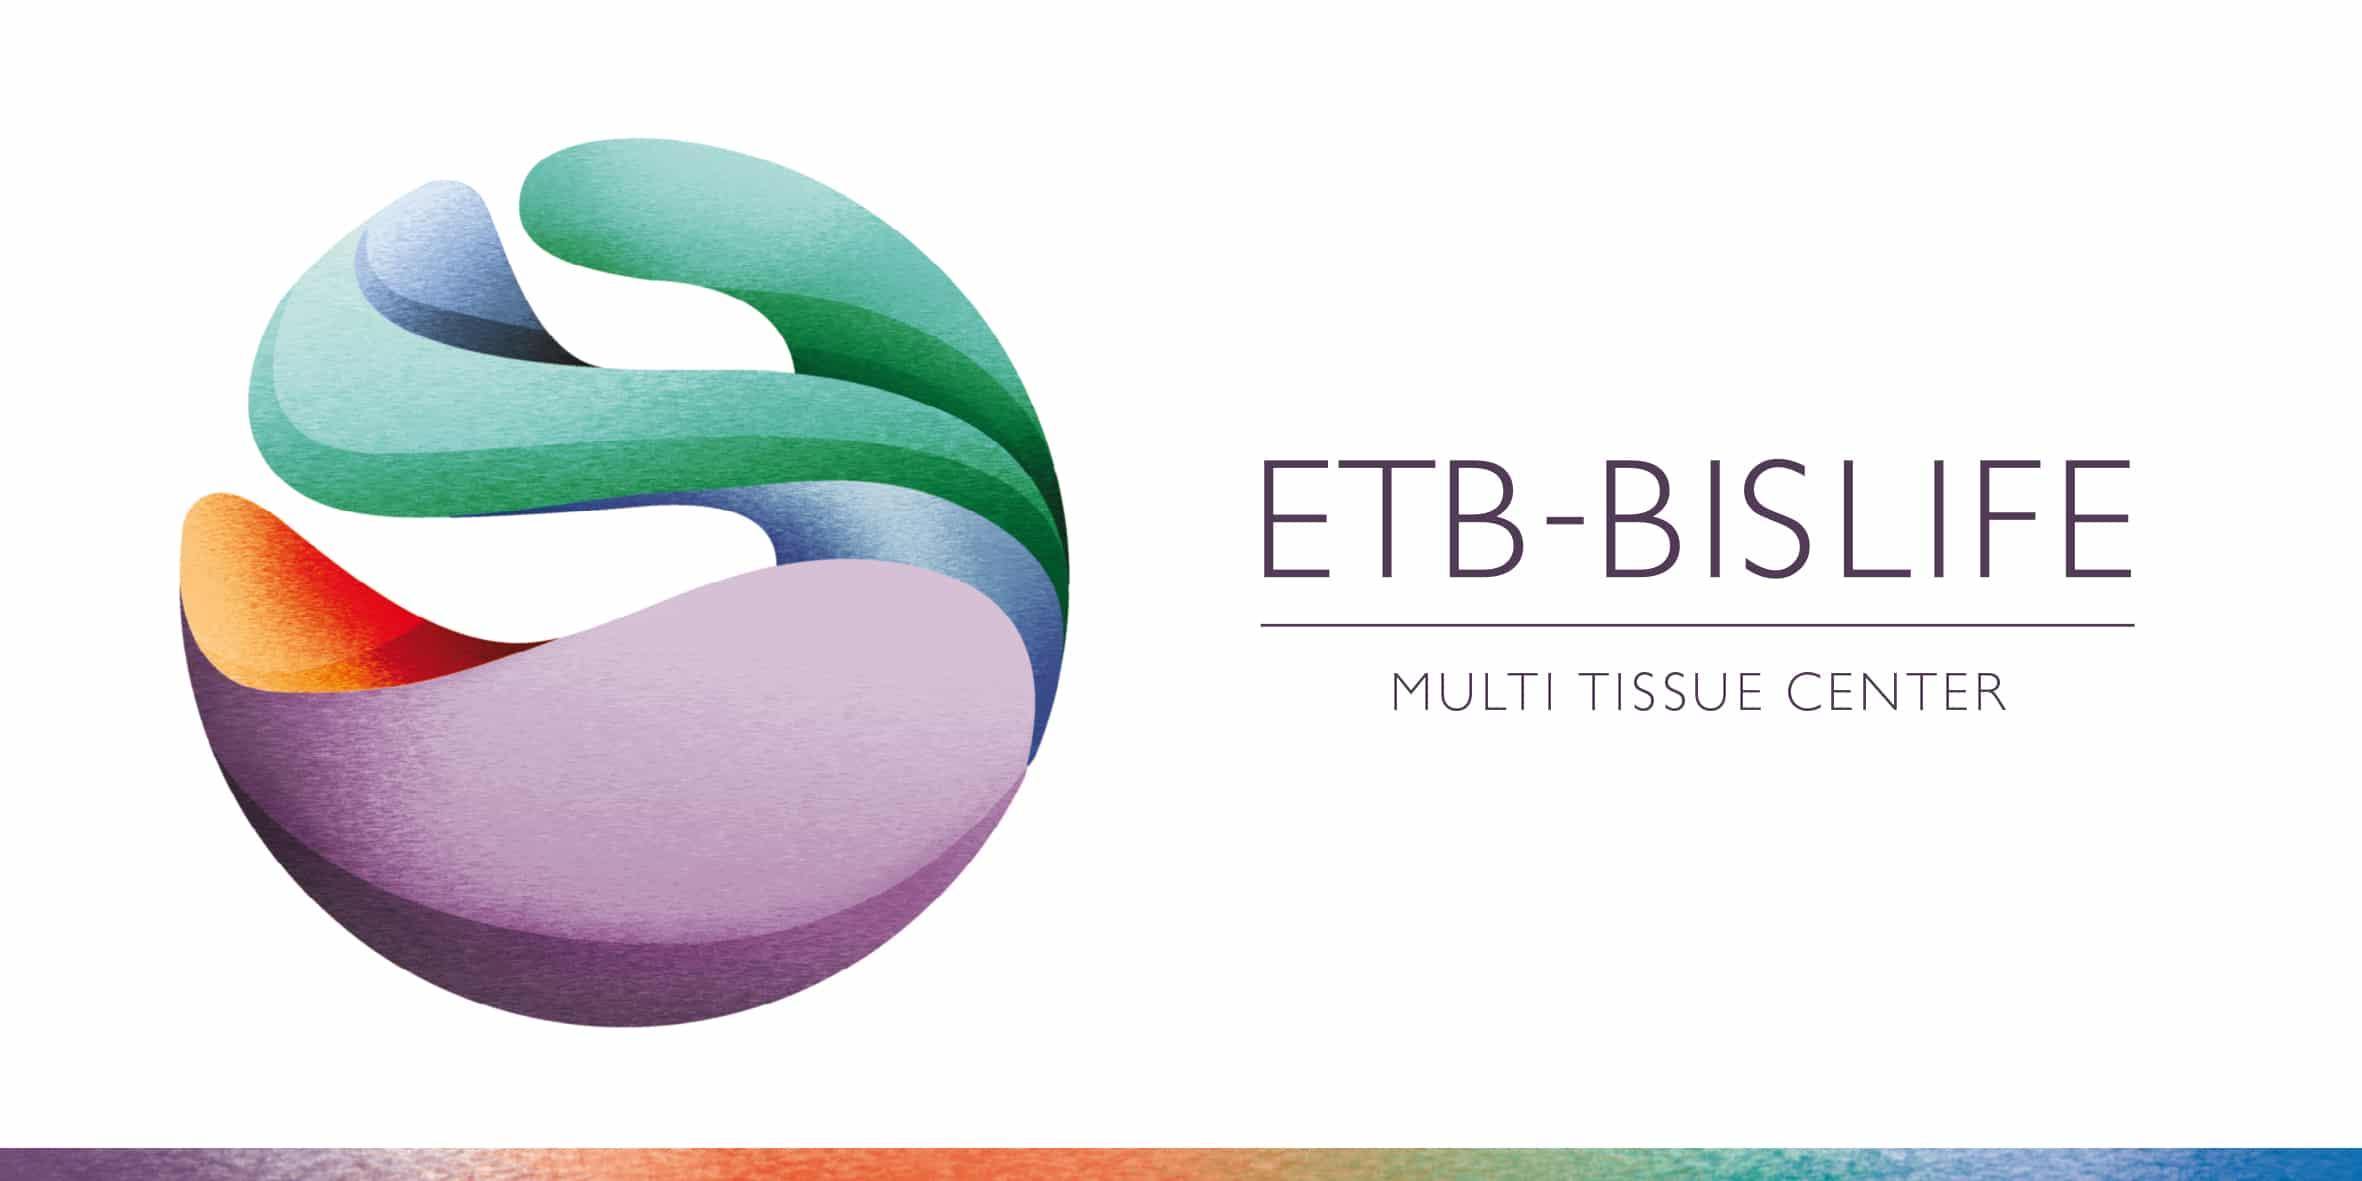 ETB-BISLIFE